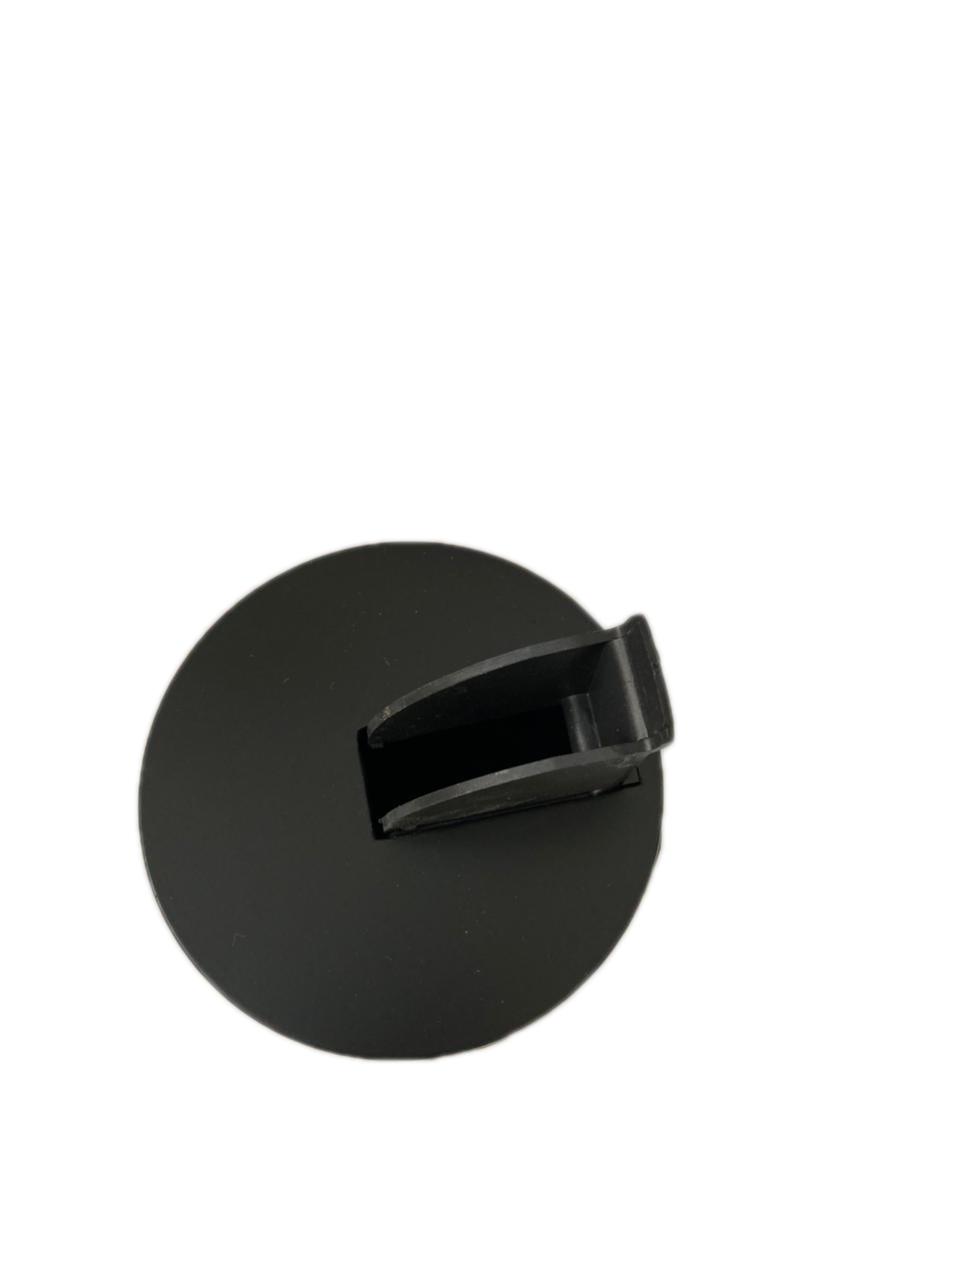 Kit Chimarrão Bolsa Feminina Marrom Geométrico Completo Exclusivo